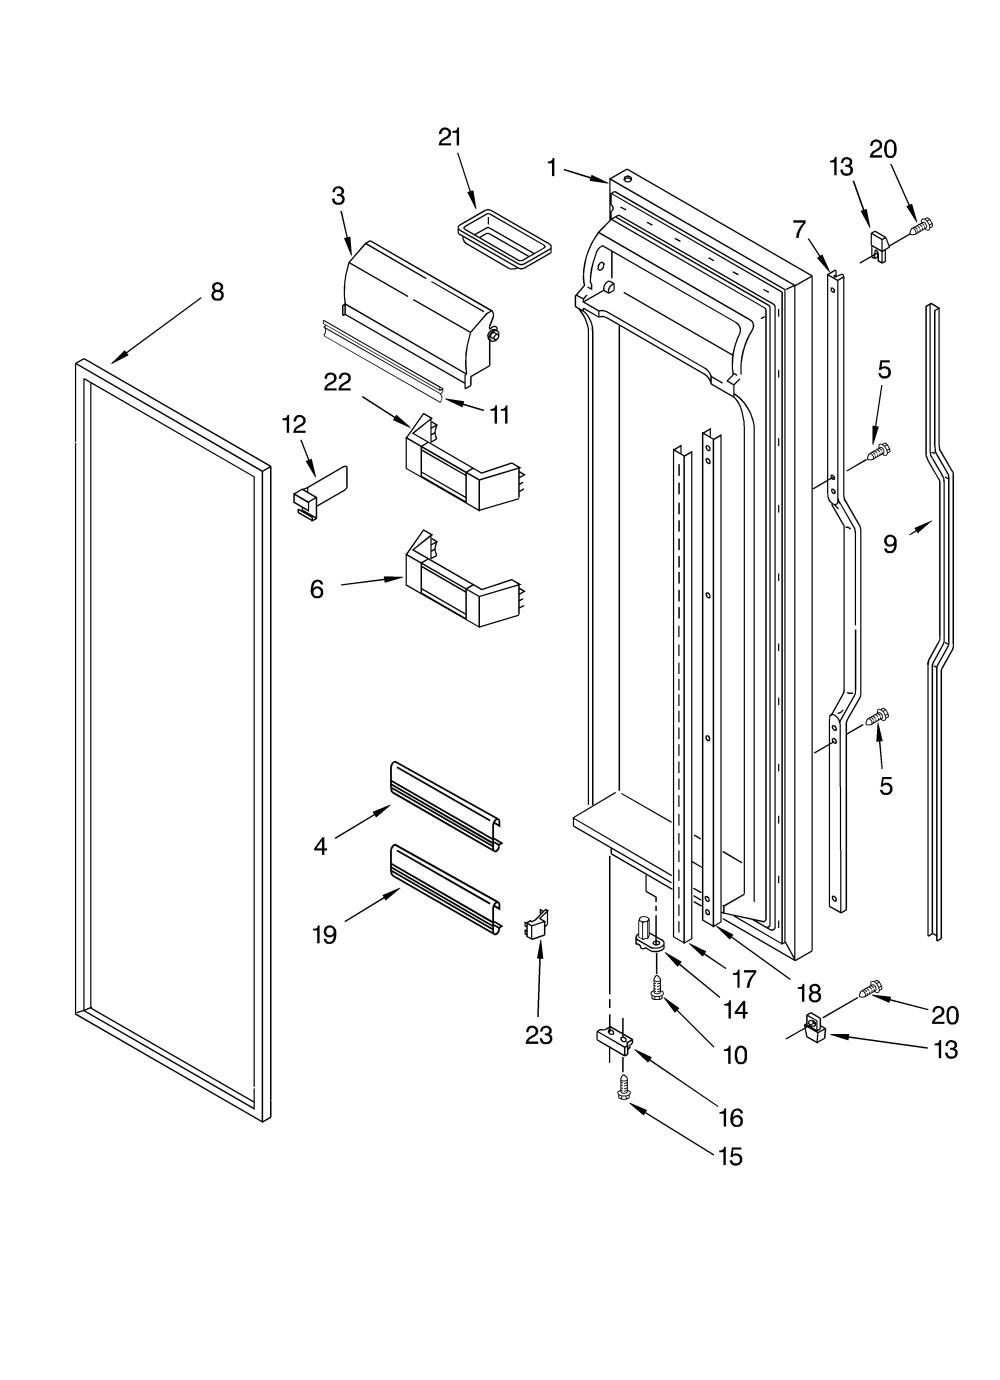 medium resolution of model gts18hcmerww refrigerator wiring diagram introduction to toy car wiring diagram kitchenaid model ksfs25fkwh01 side by